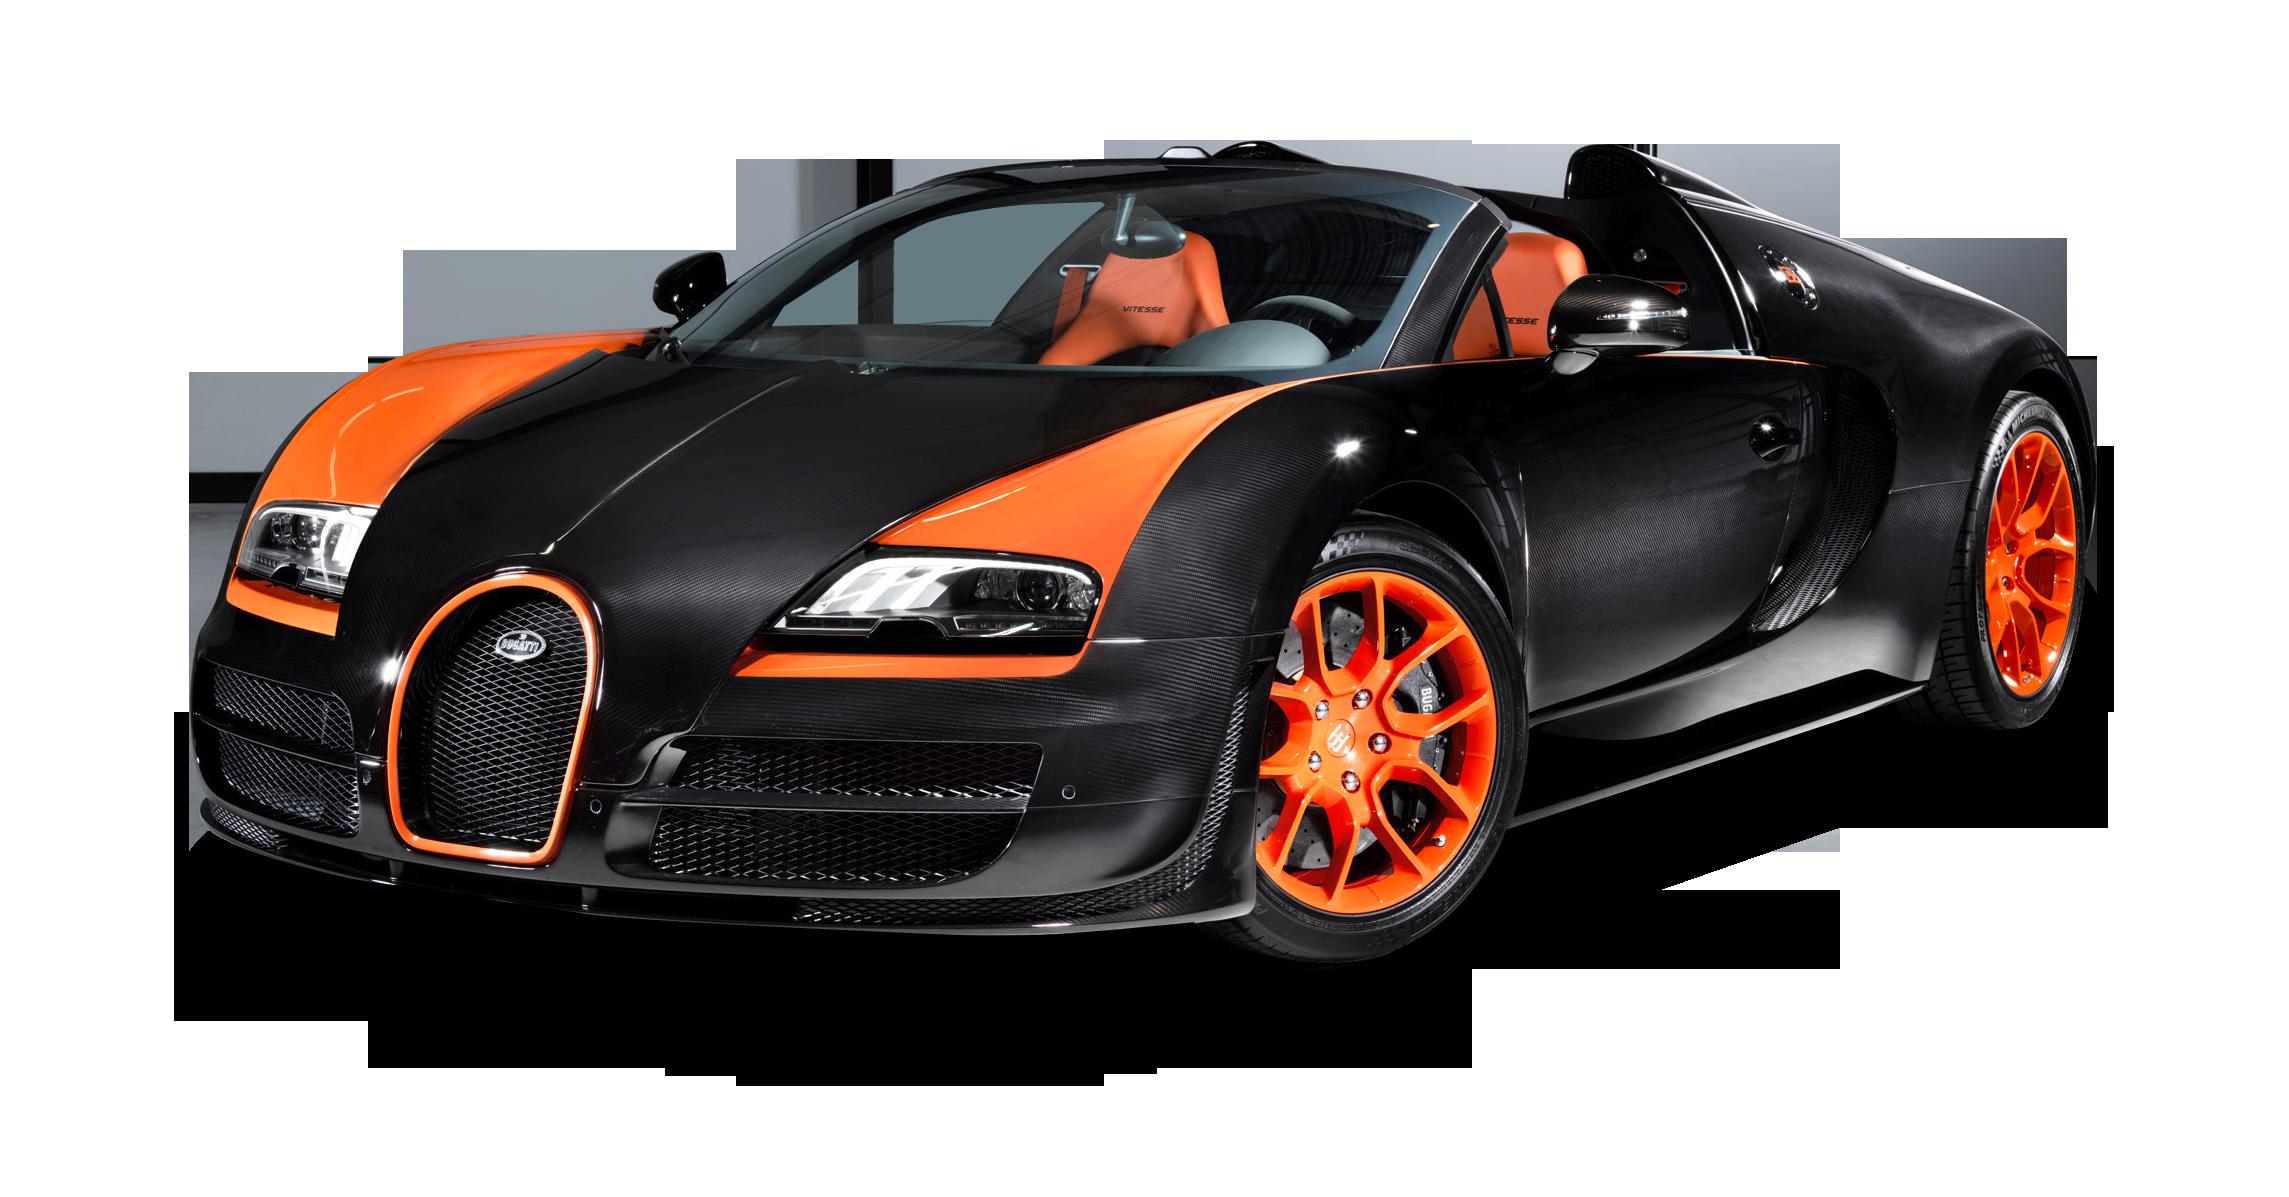 Bugatti Veyron PNG-PlusPNG pluspng.com-2289 - Bugatti Veyron PNG - Bugatti HD PNG